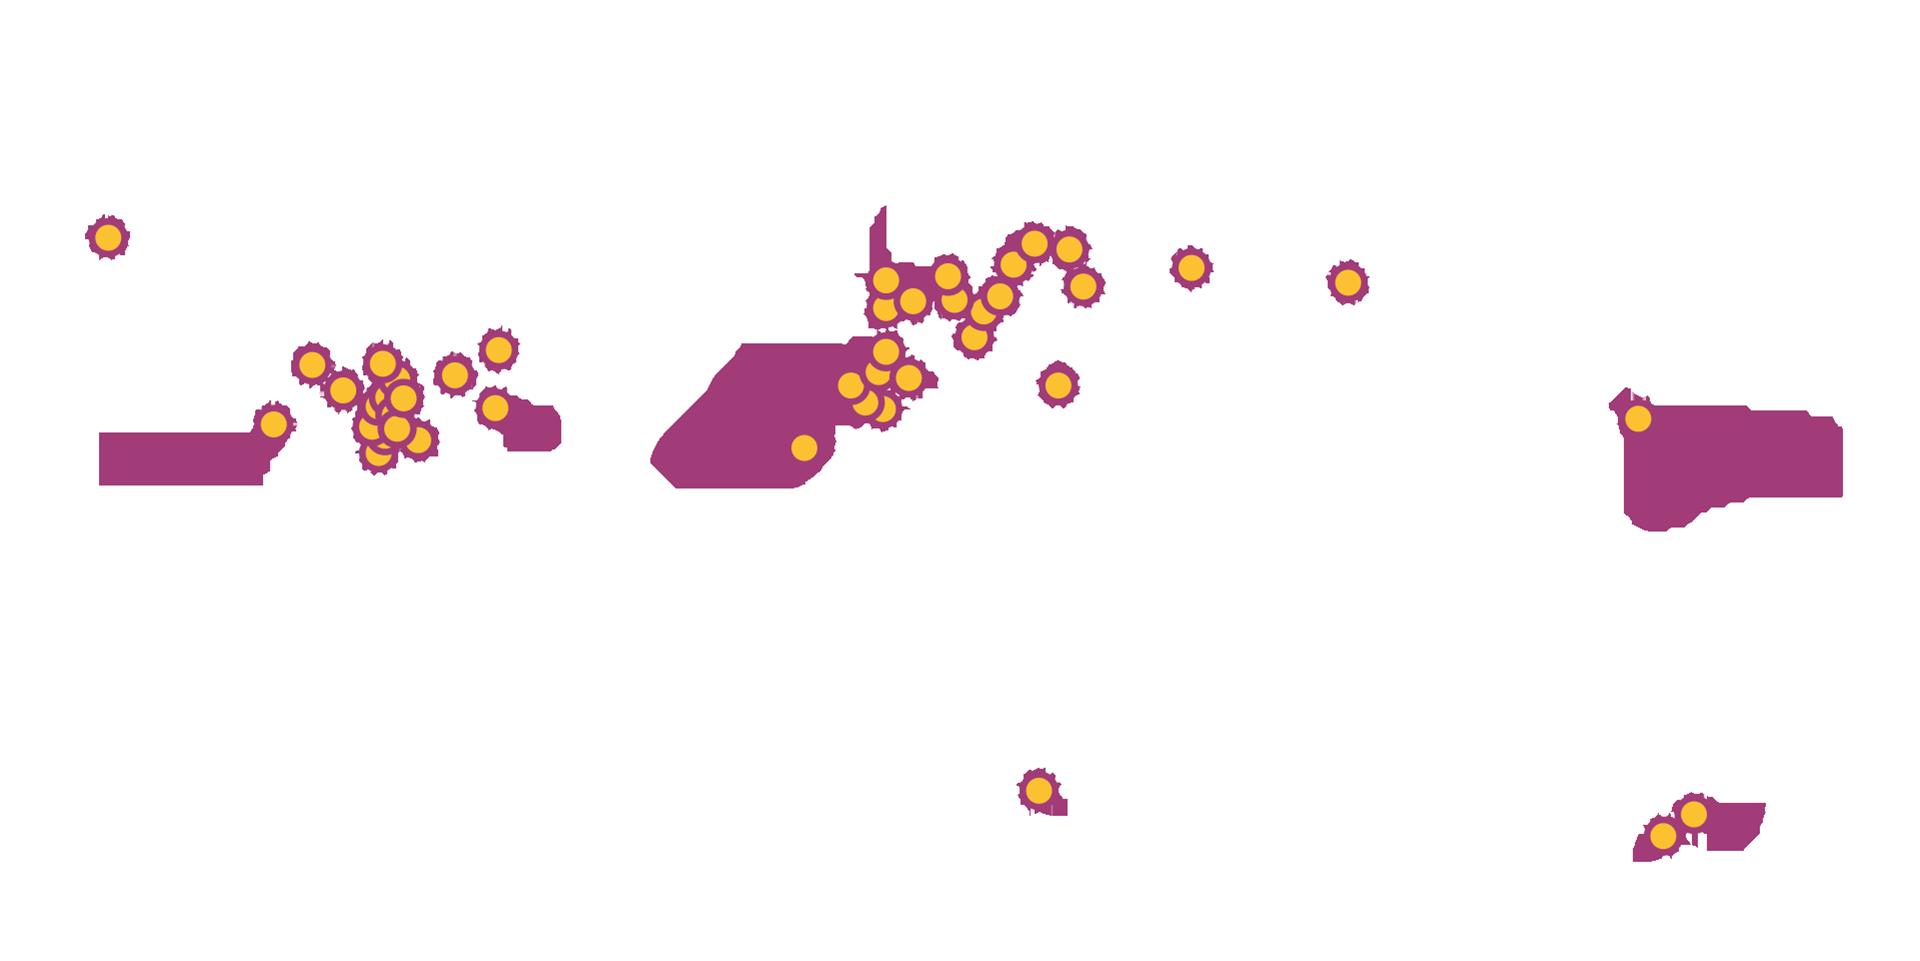 210816-nanocam-mapa-1920x961